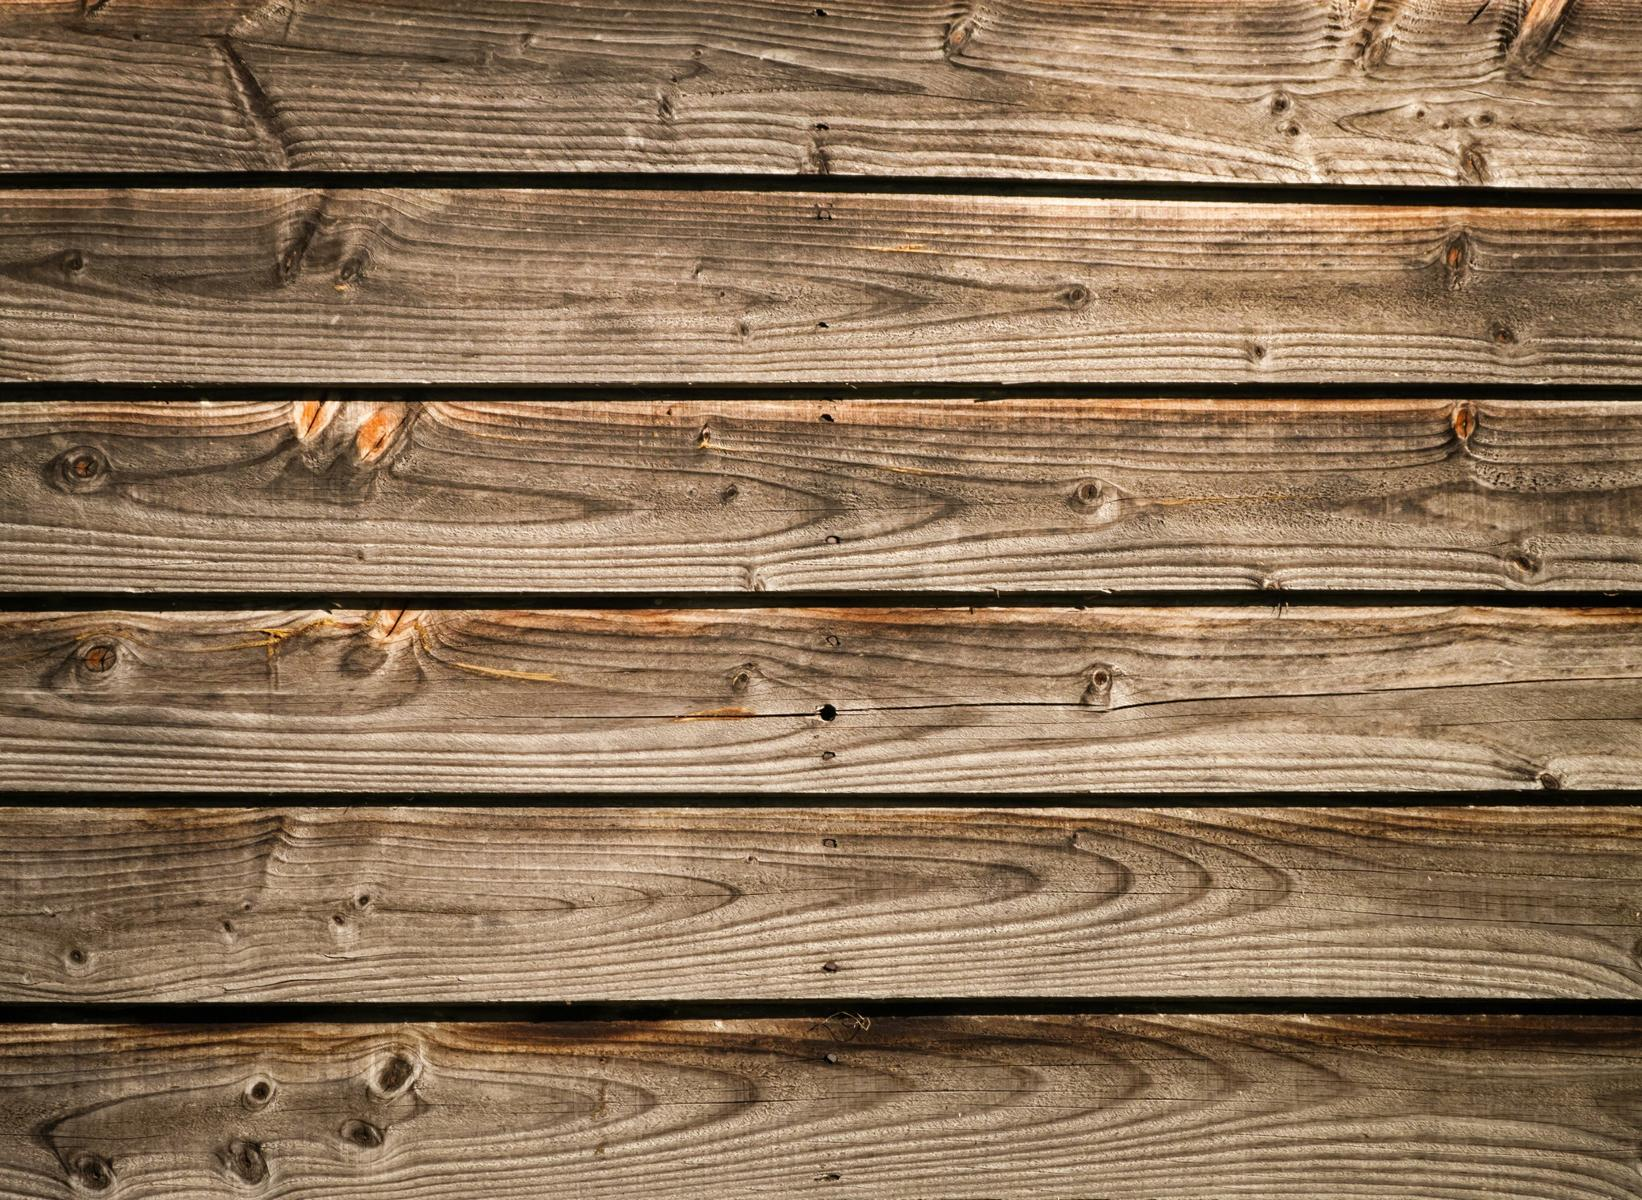 How To Whitewash Wood Panel Walls Barn Board Wallpaper Wallpapersafari